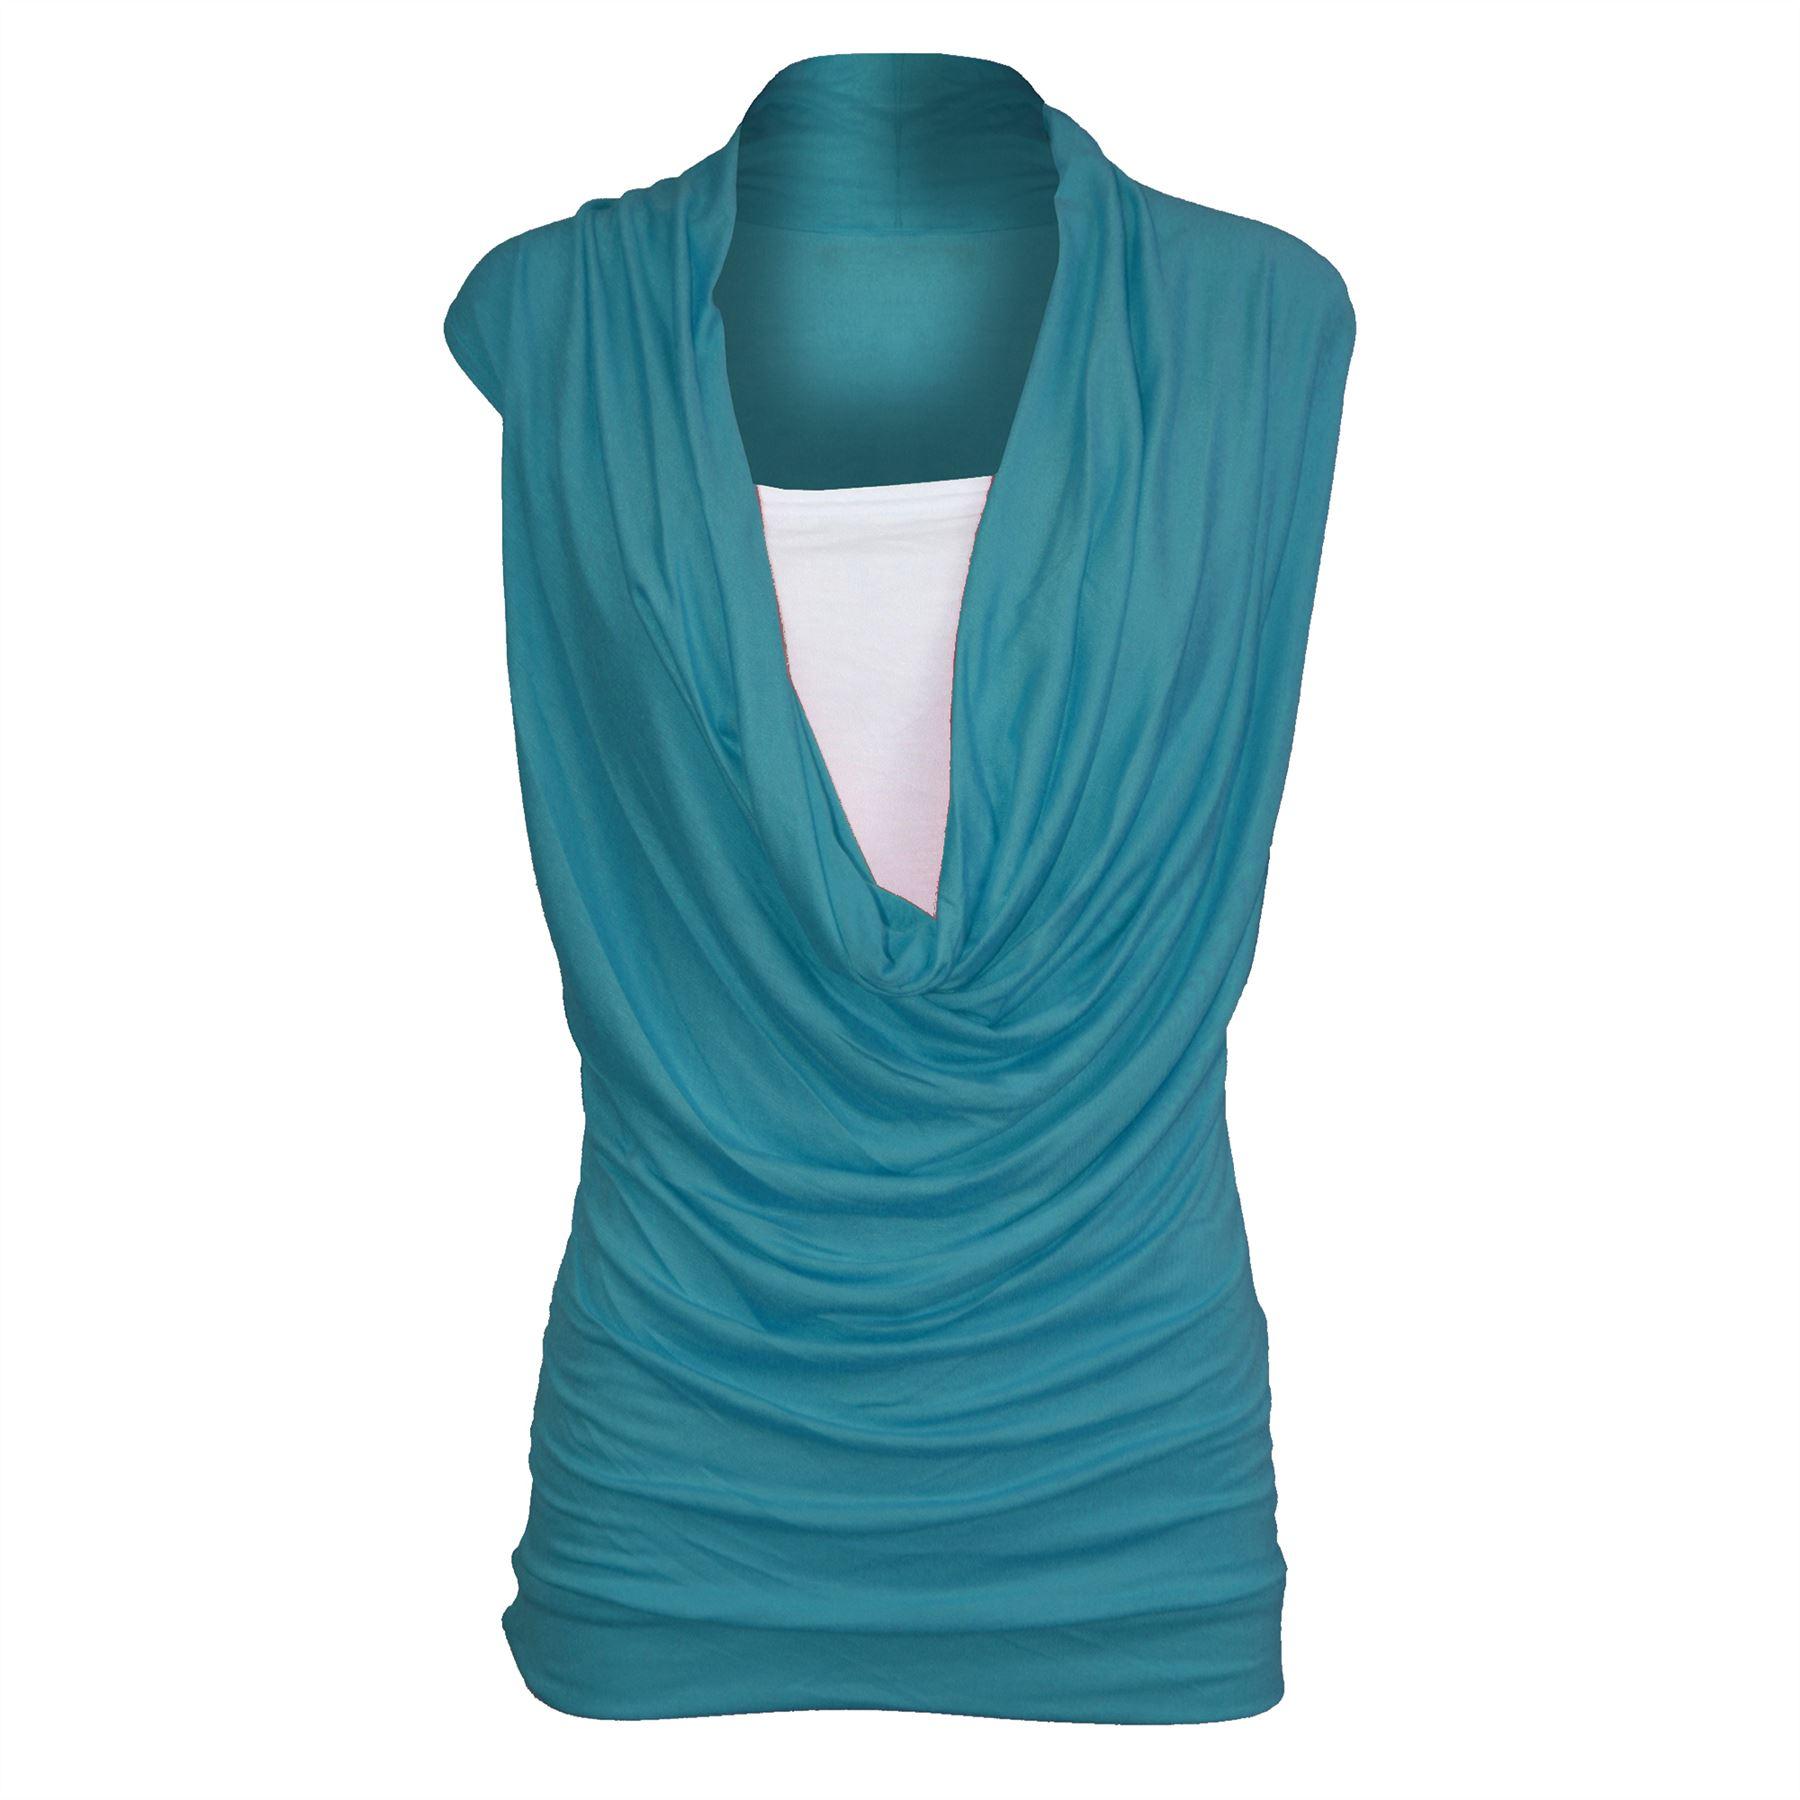 Cowl Neckline: Womens Ladies Sleeveless Cowl Neck Vest Jersey T Shirt Top